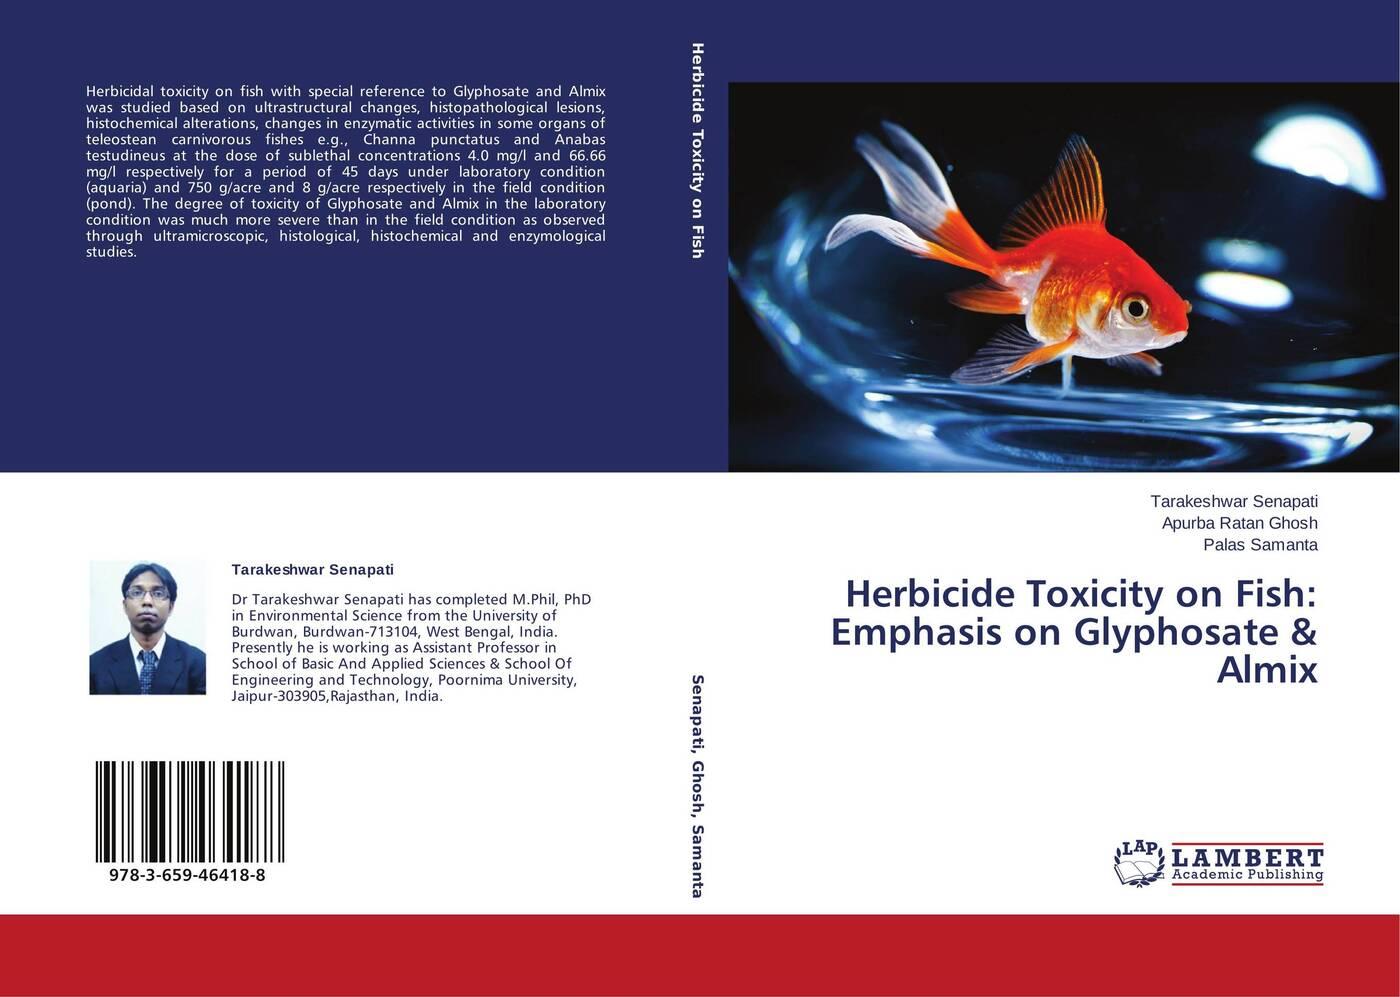 Tarakeshwar Senapati,Apurba Ratan Ghosh and Palas Samanta Herbicide Toxicity on Fish: Emphasis on Glyphosate & Almix studies on the effect of hcg on maturity of channa striatus bloch